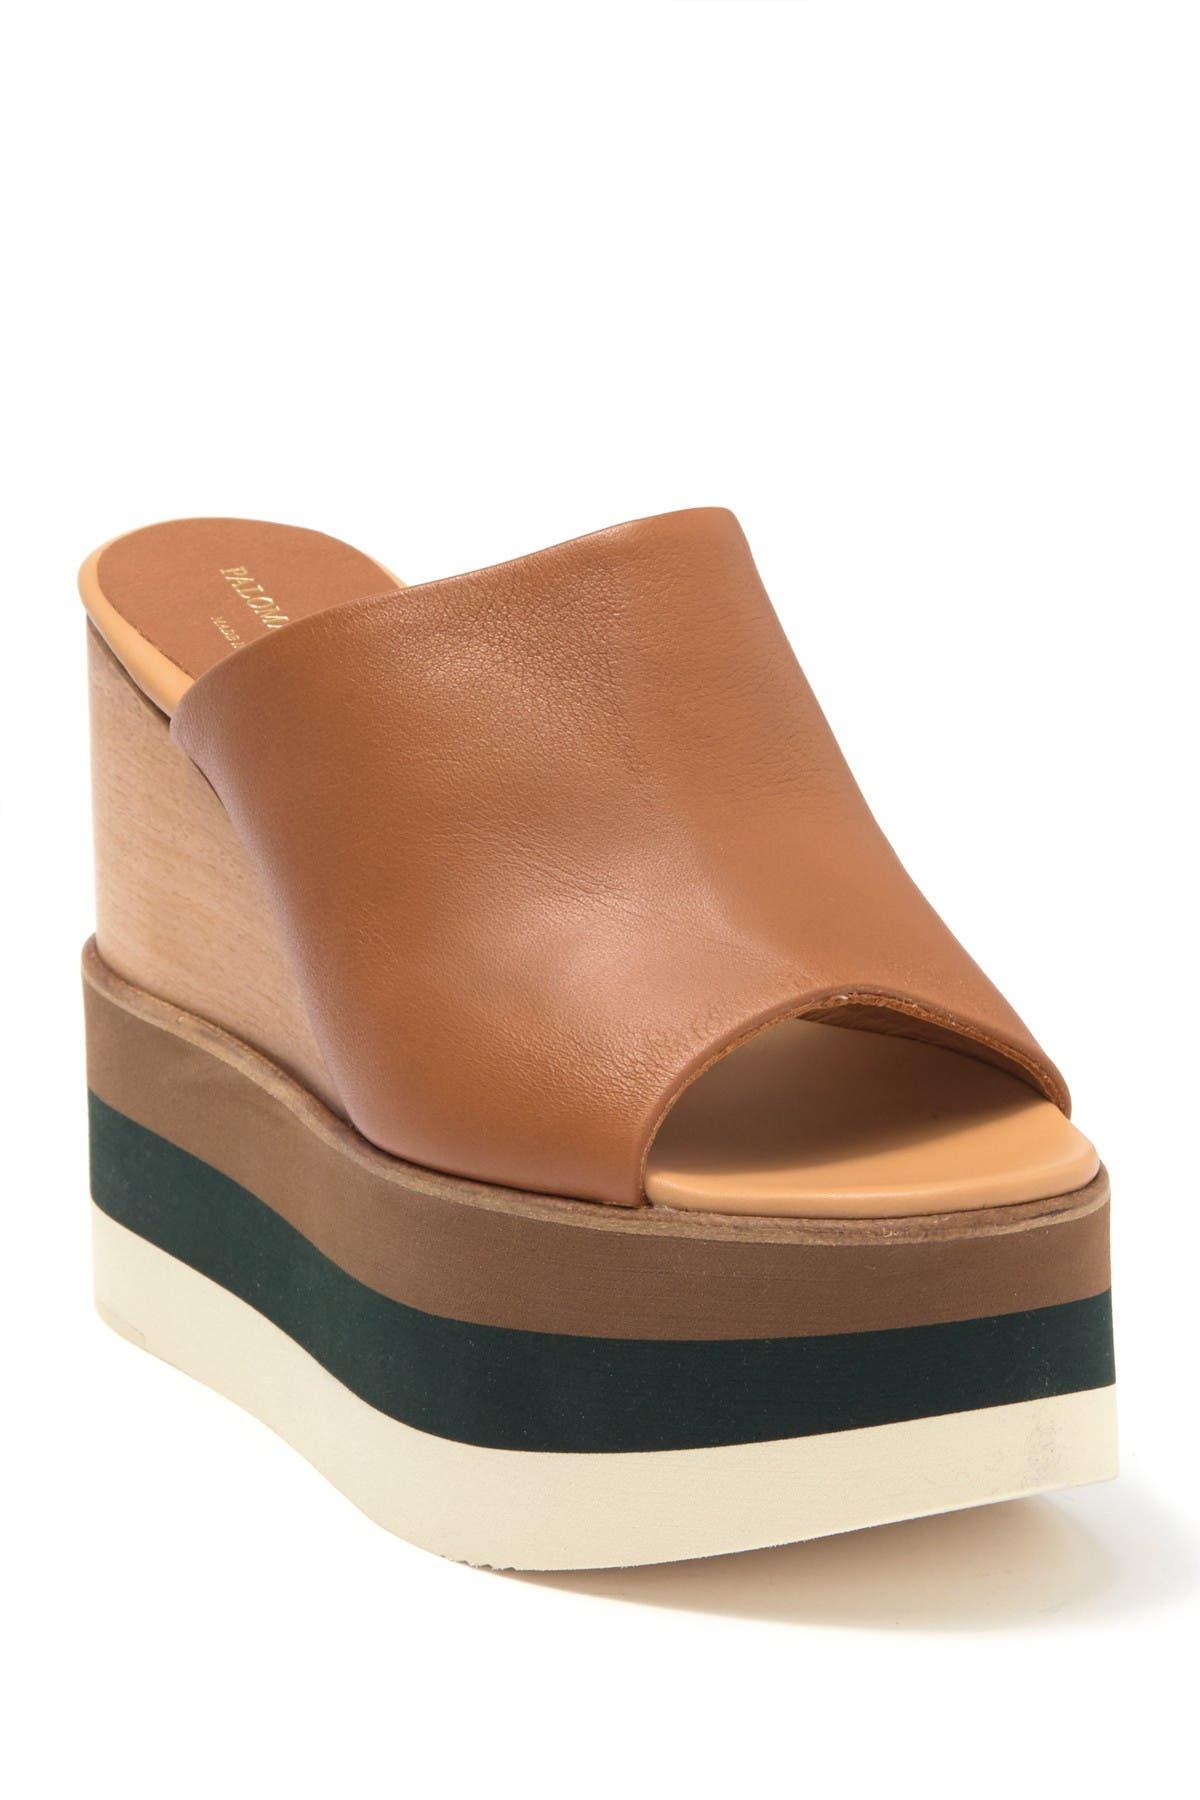 Image of Paloma Barcelo Daria Leather Wedge Mule